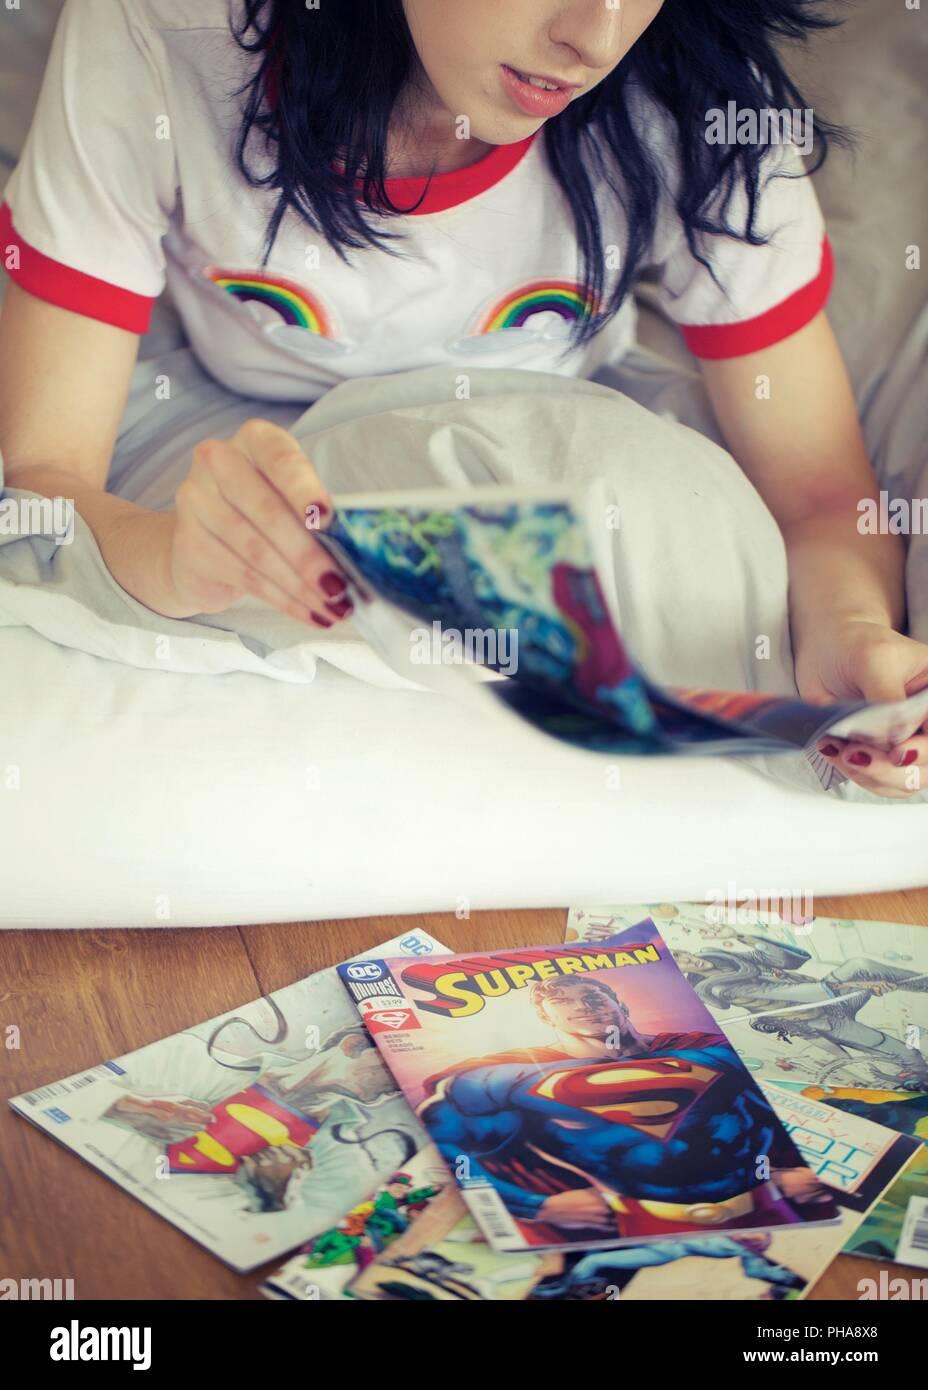 girl reading comics - Stock Image